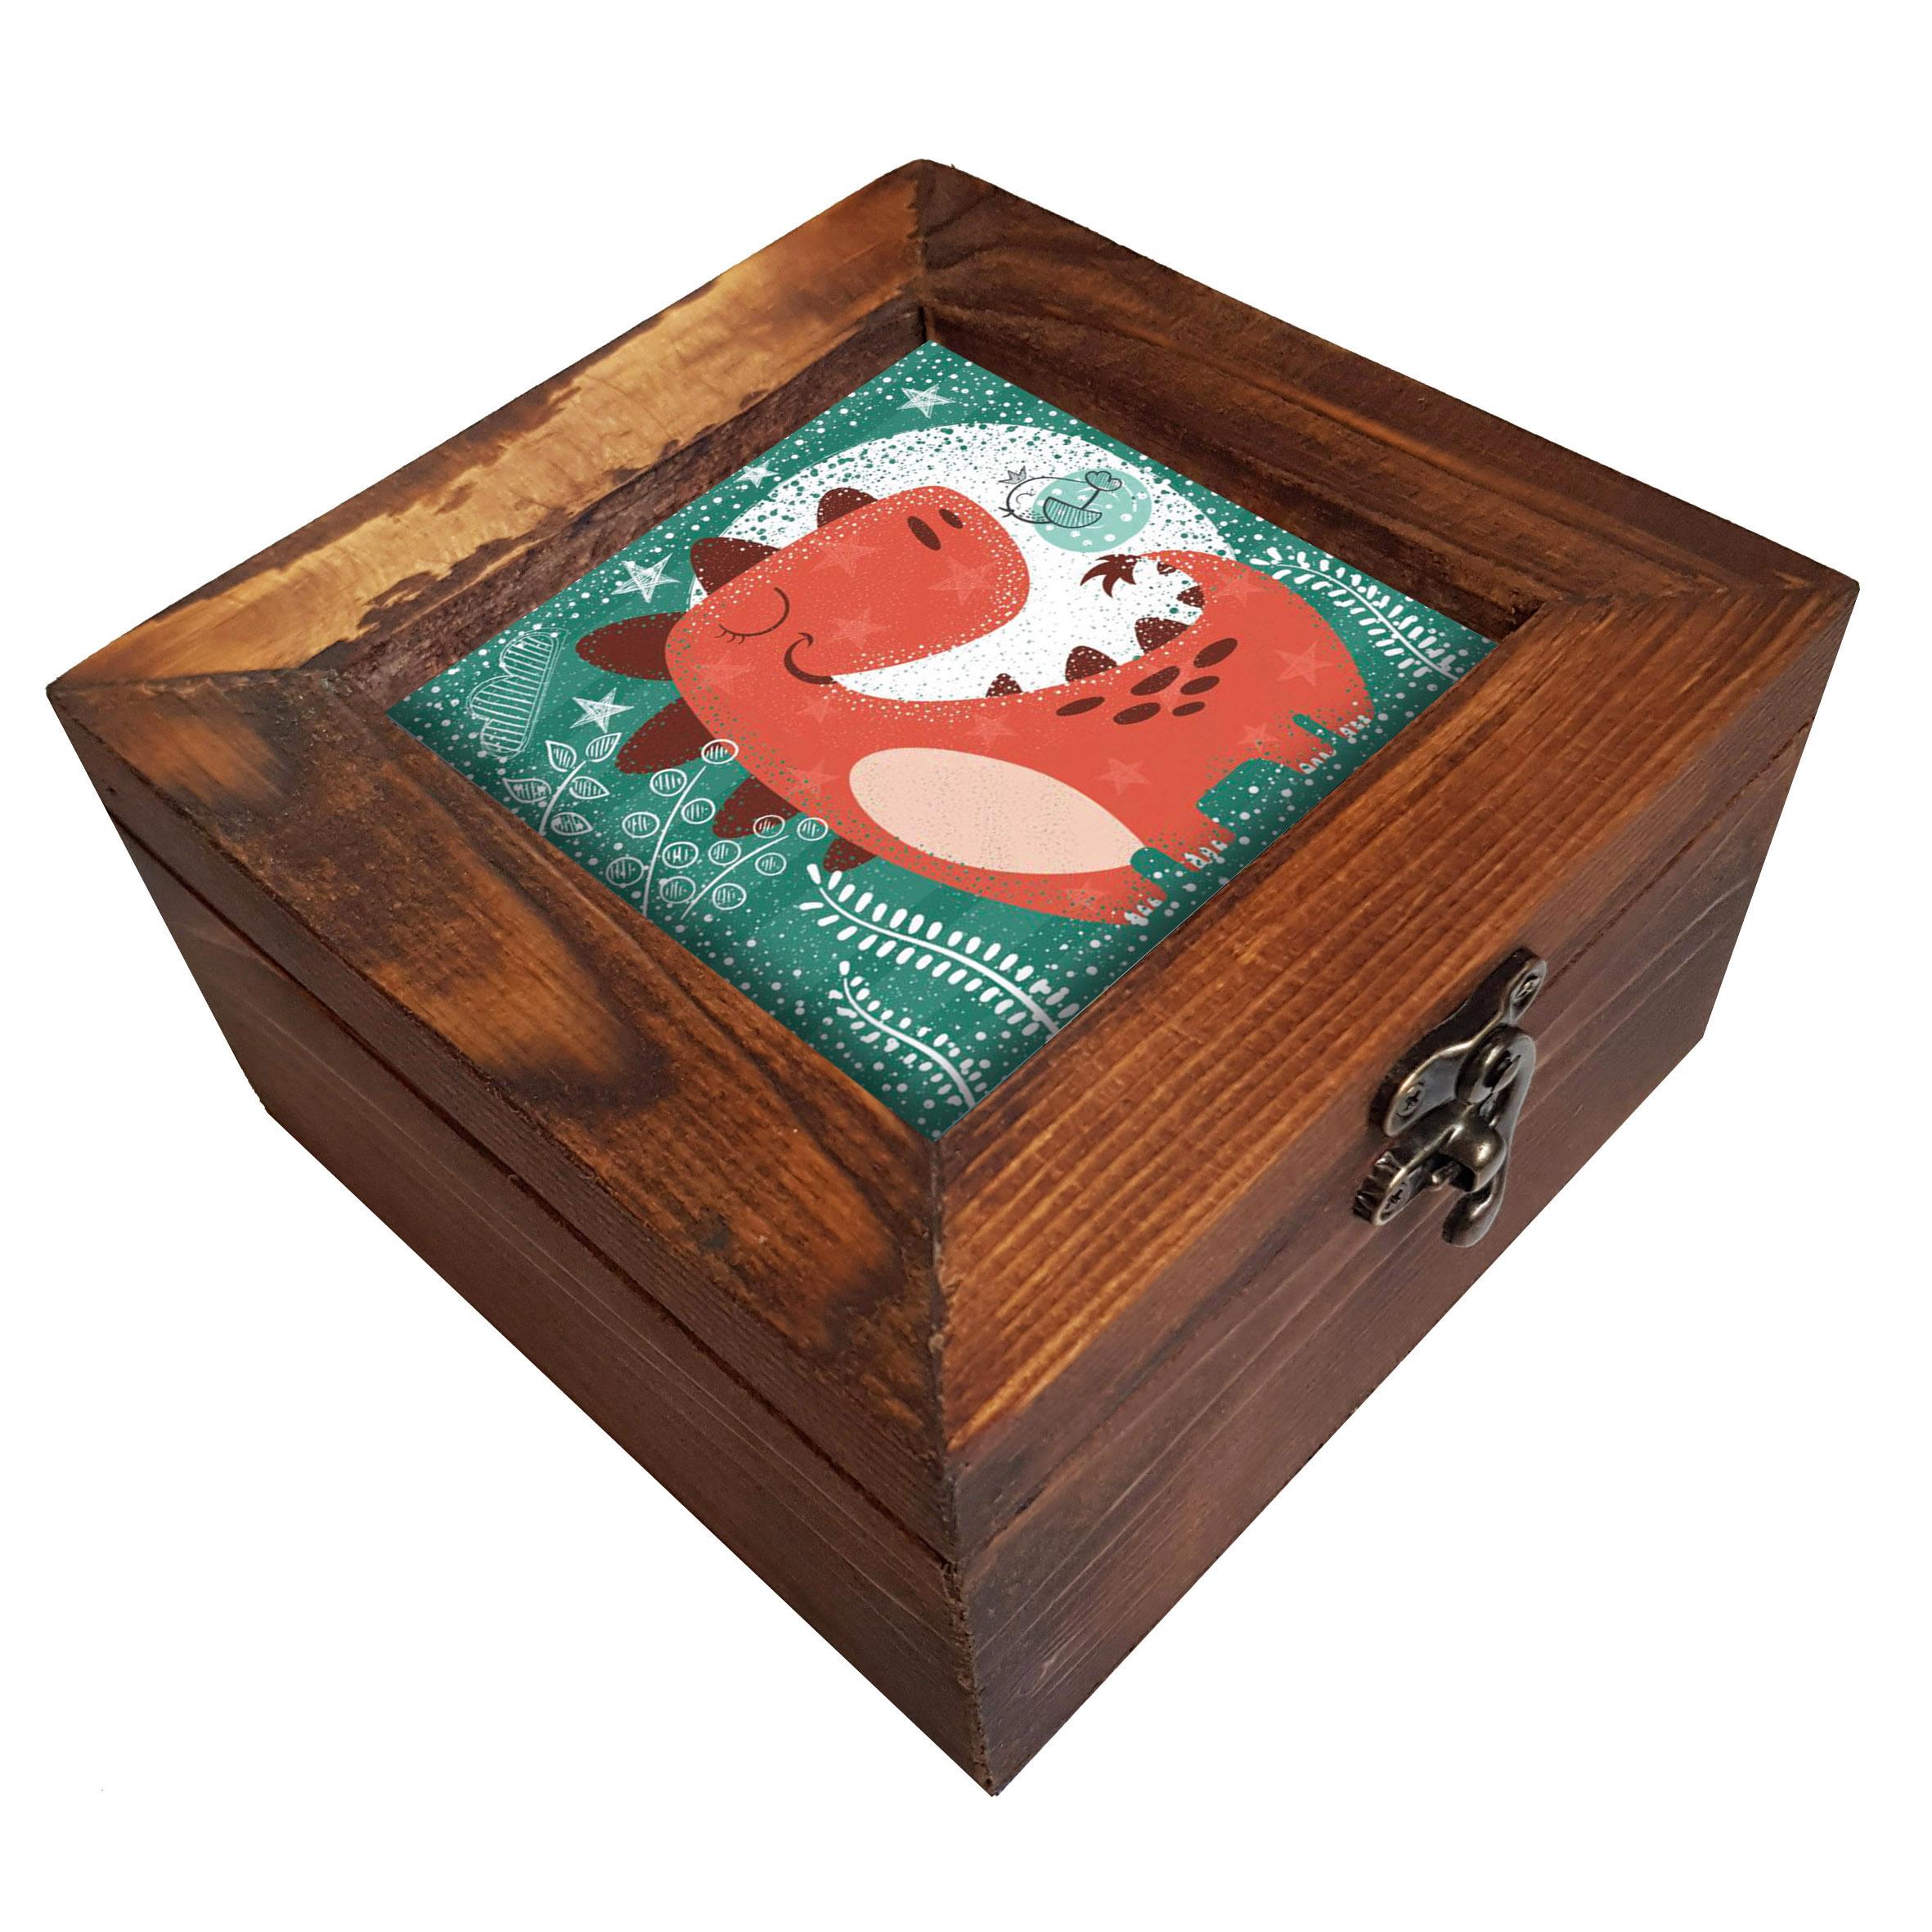 جعبه هدیه چوبی کد A51